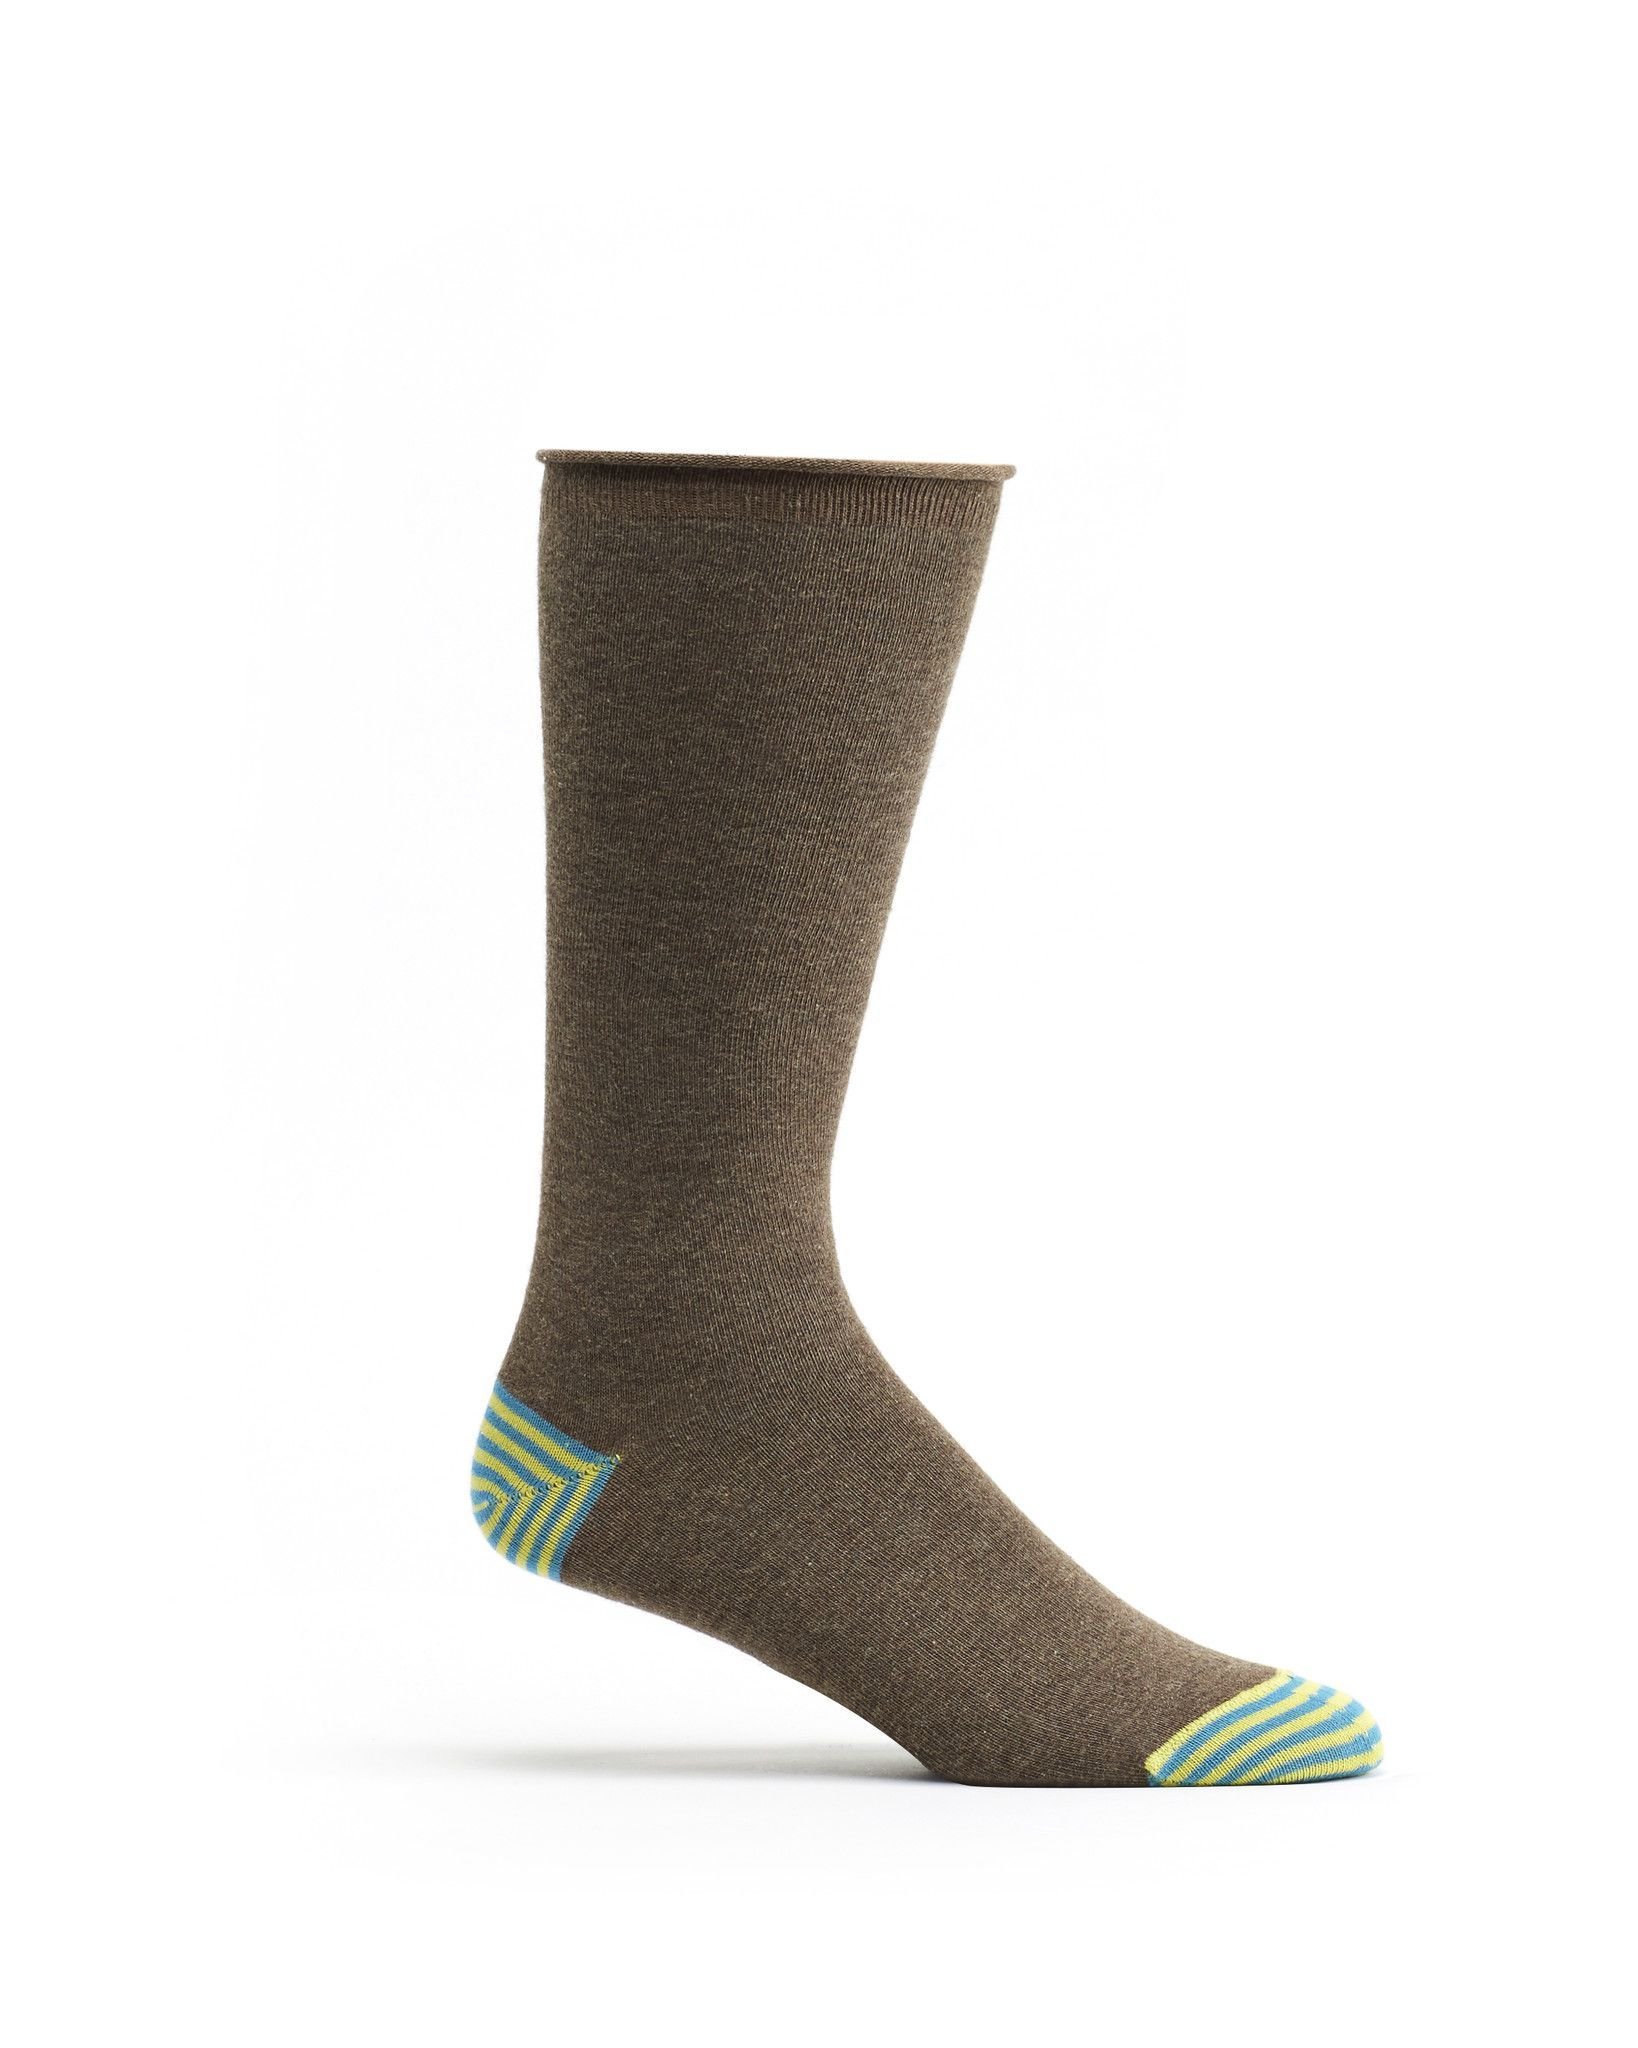 Ozone Men's Basic Socks